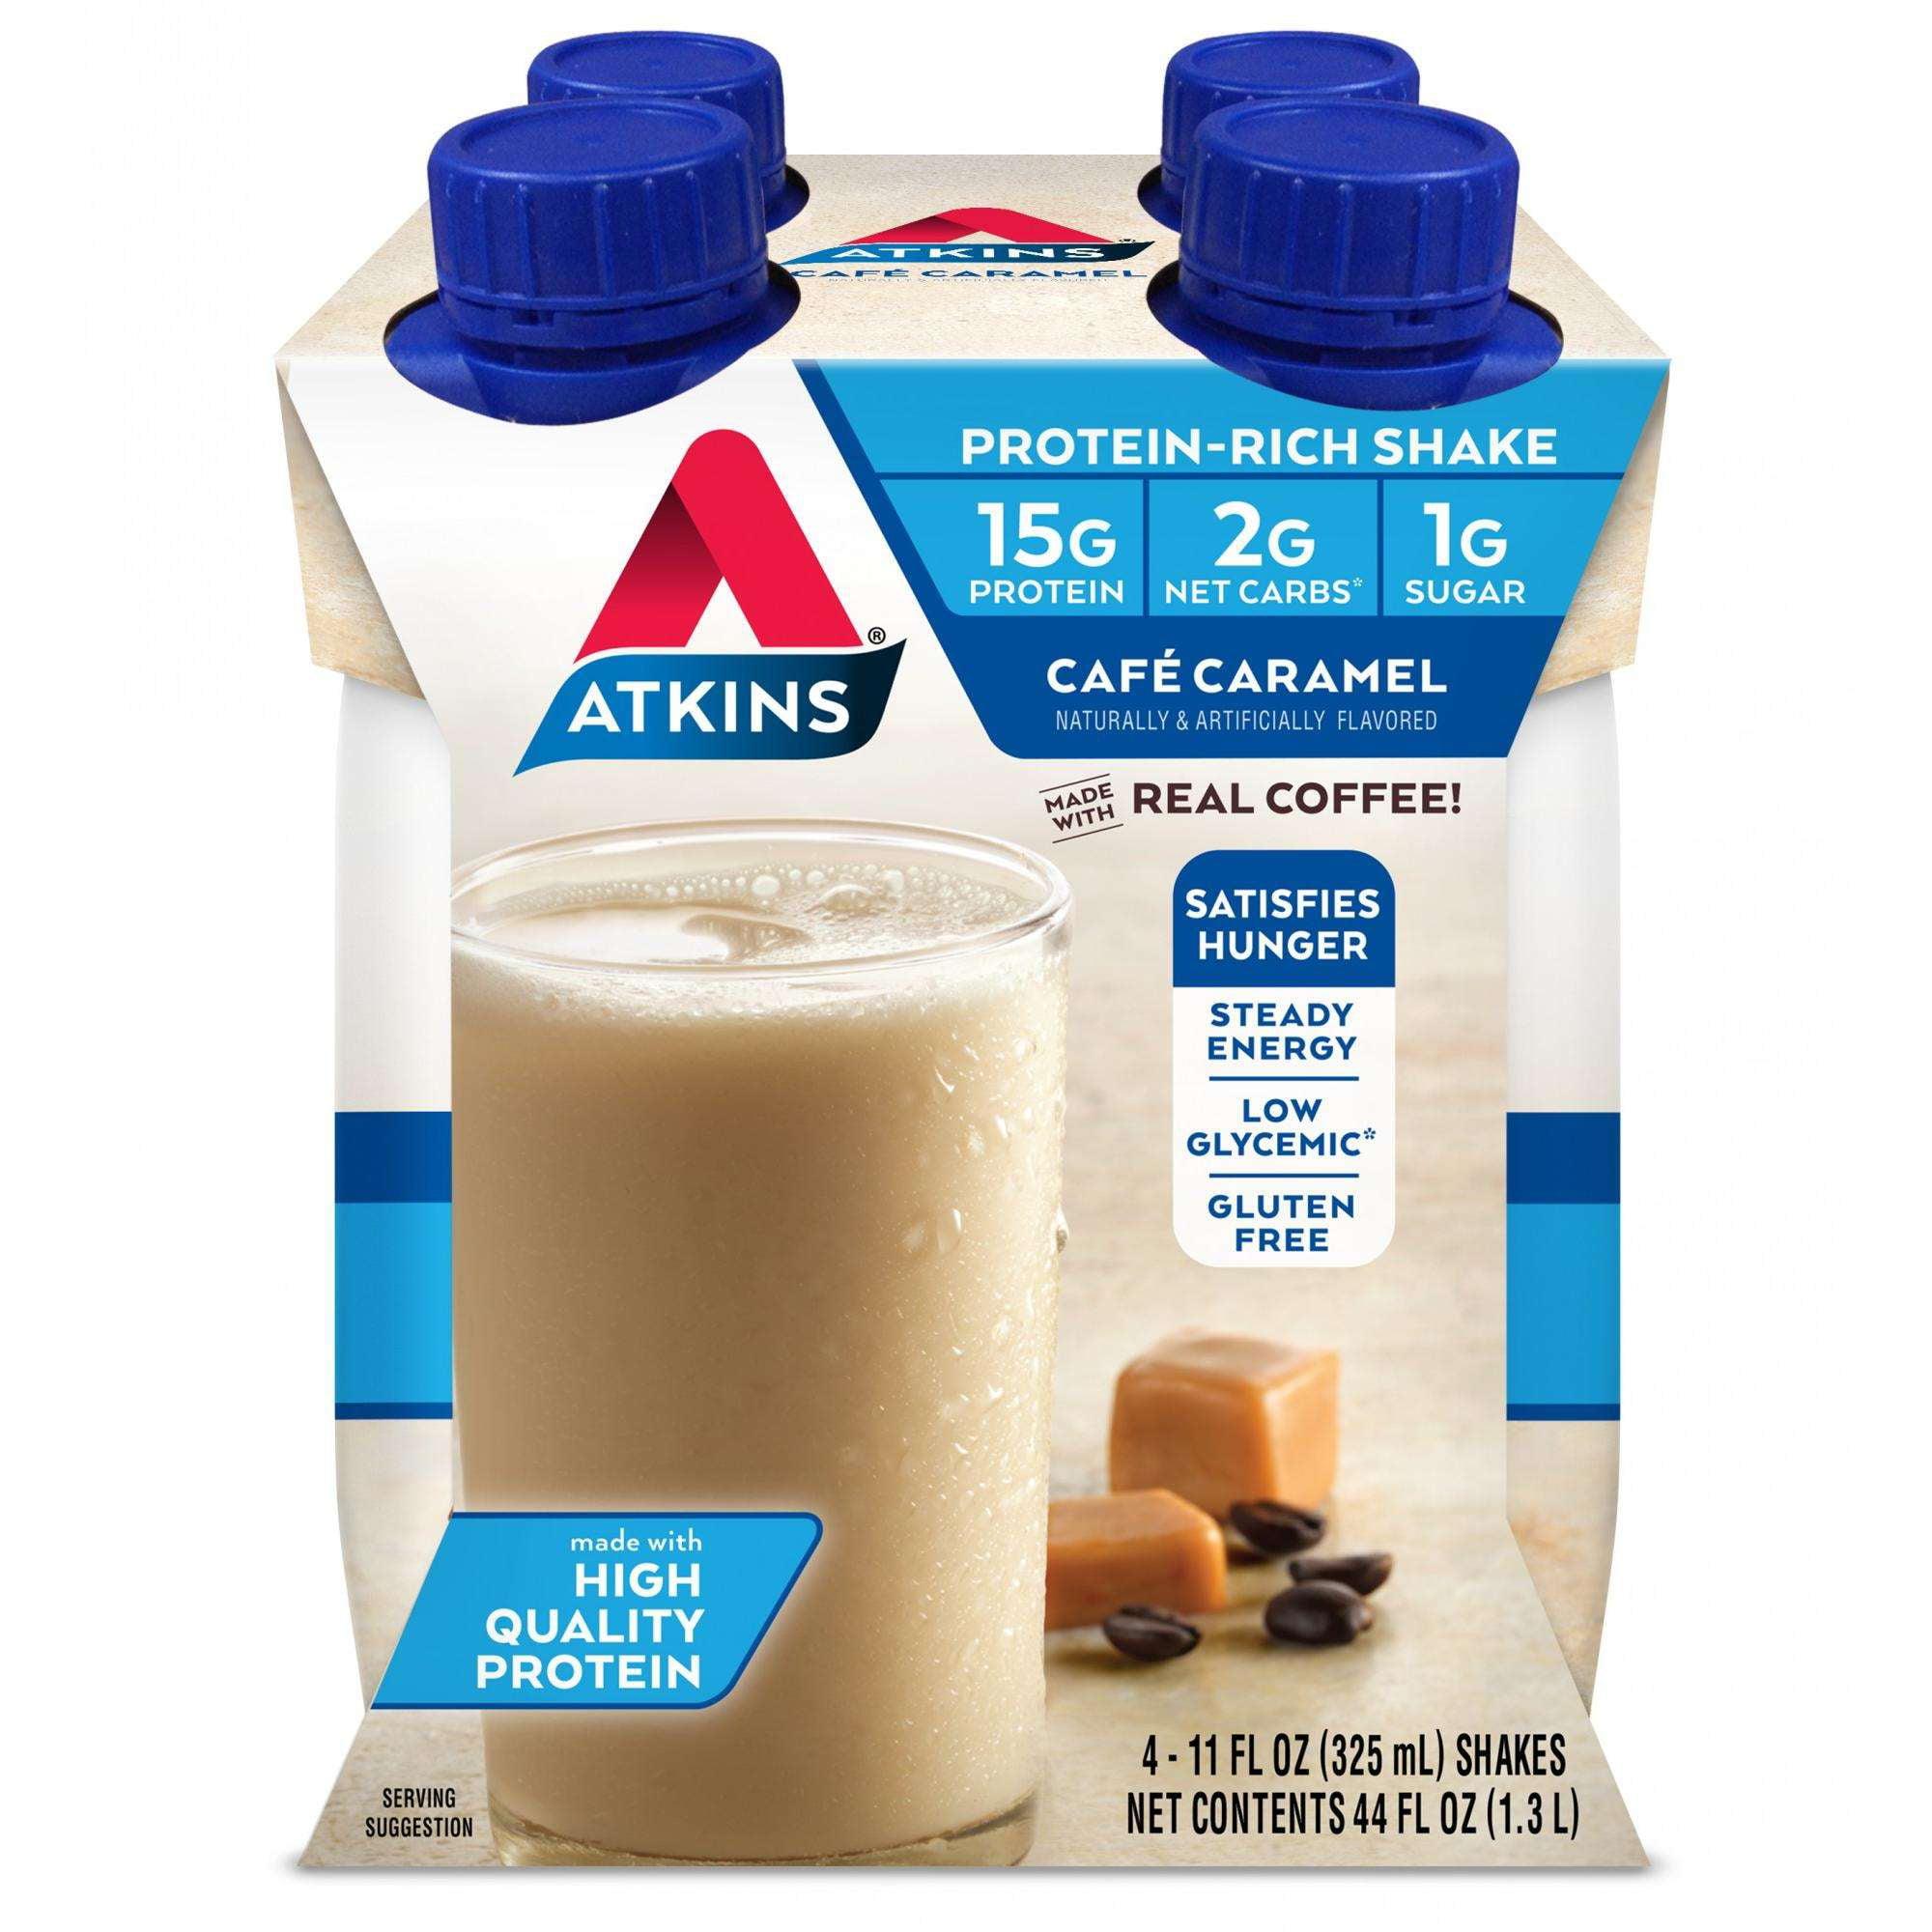 Atkins Cafe Caramel Latte Shake, 11Fl oz., 4-pack (Ready To Drink)